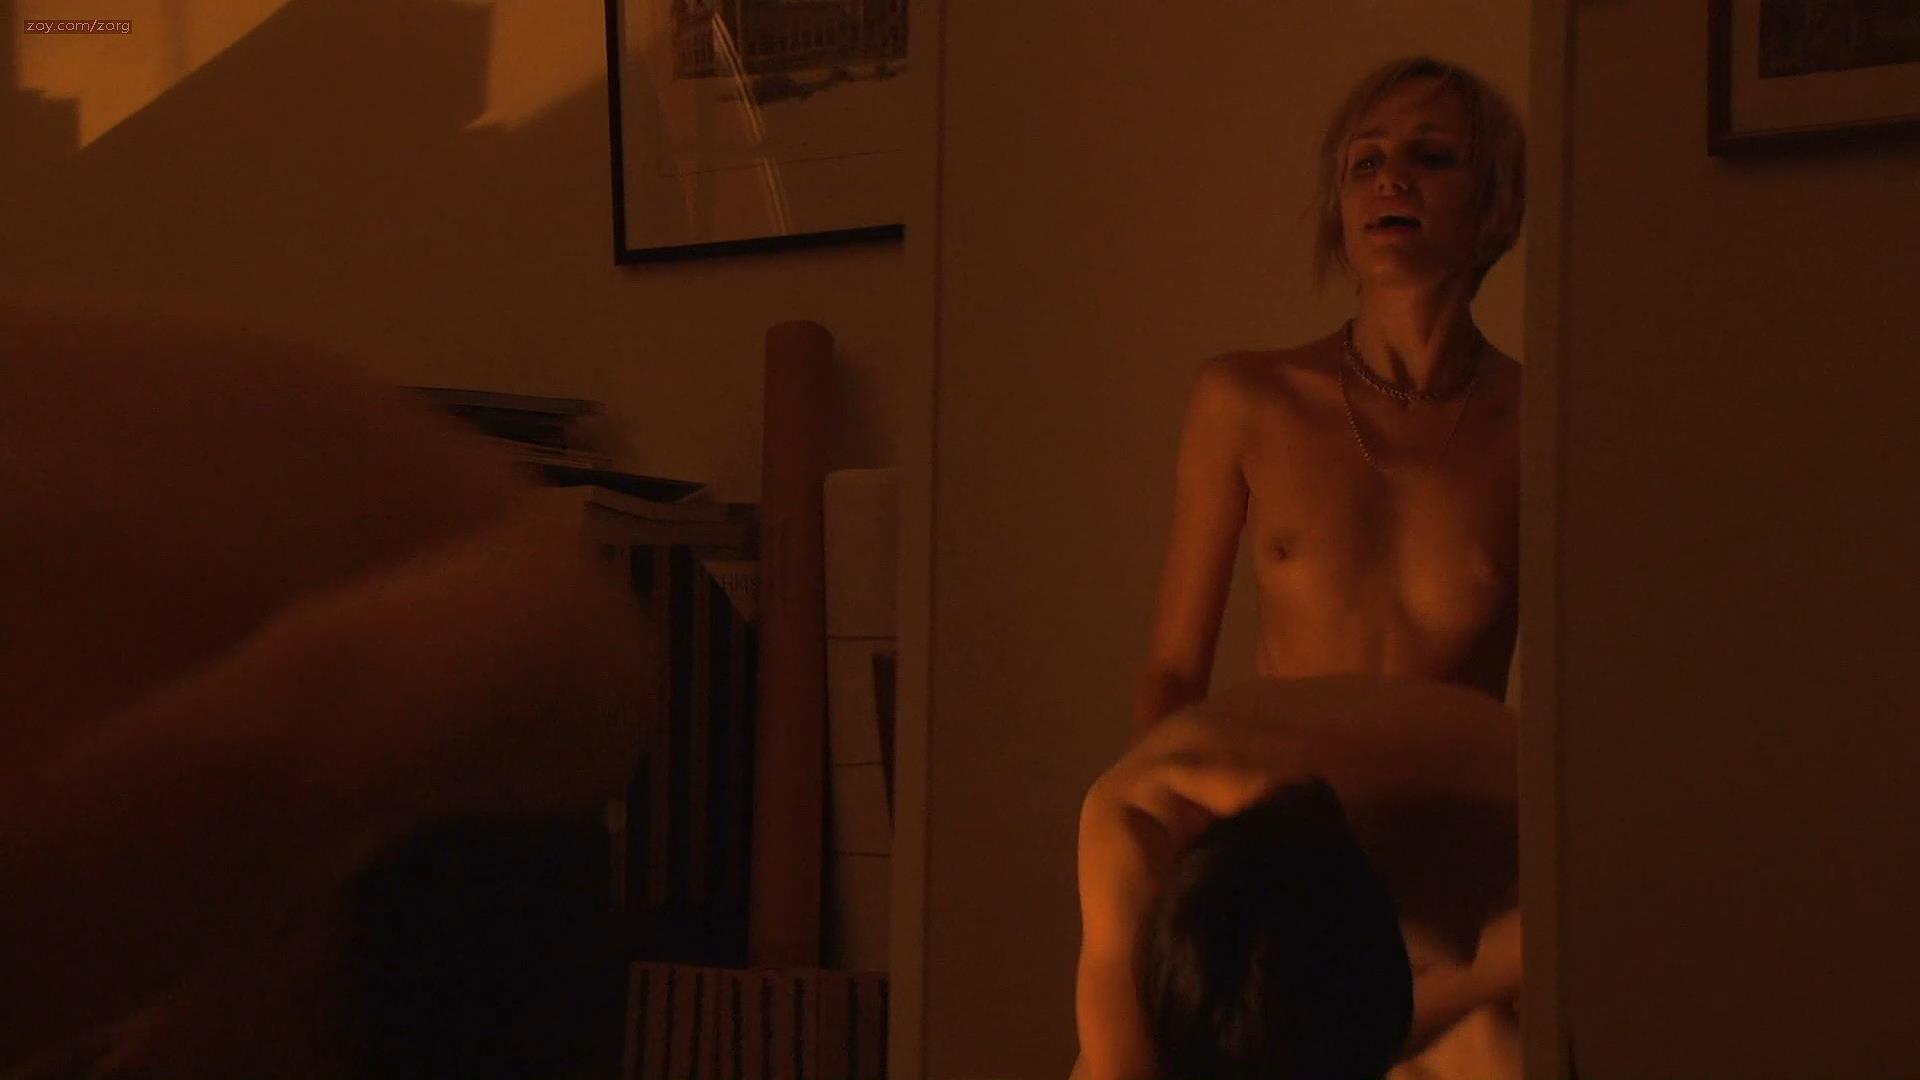 Ruta Gedmintas Nude Lesbian Sex Natasha O Keeffe And -6465